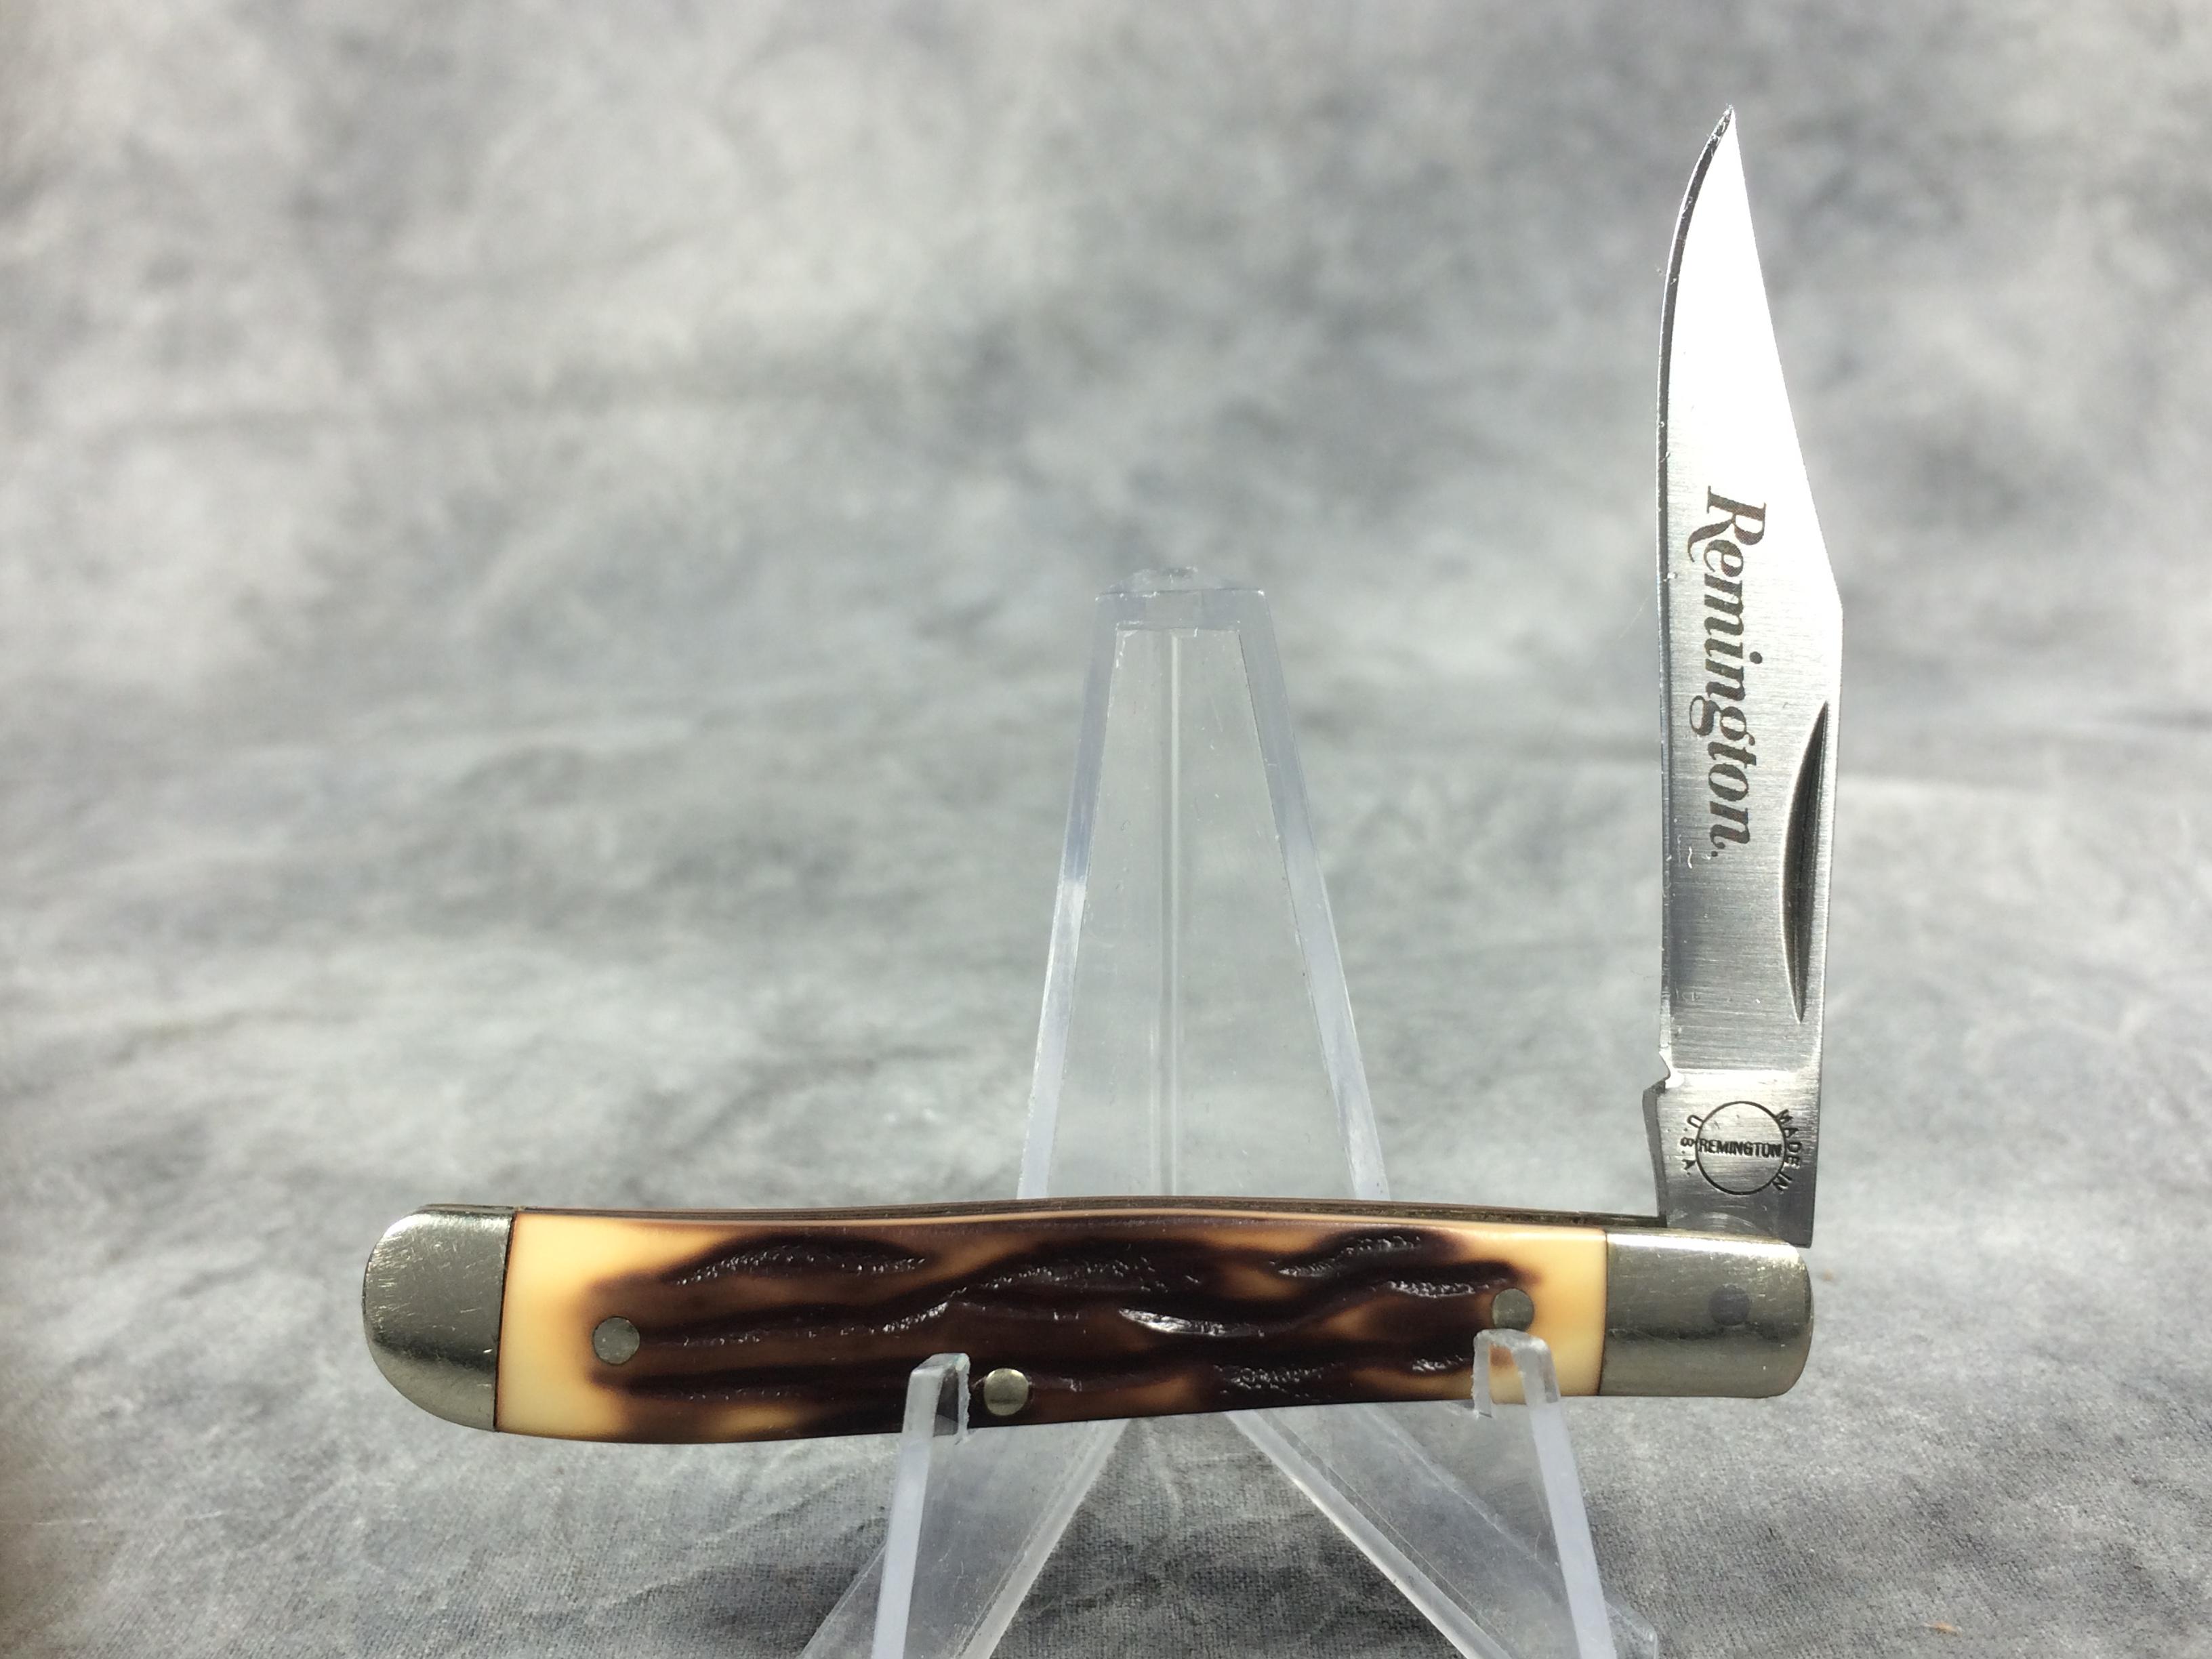 Remington Umc Usa Single Blade Peanut Hunt Fish Vtg Pocket